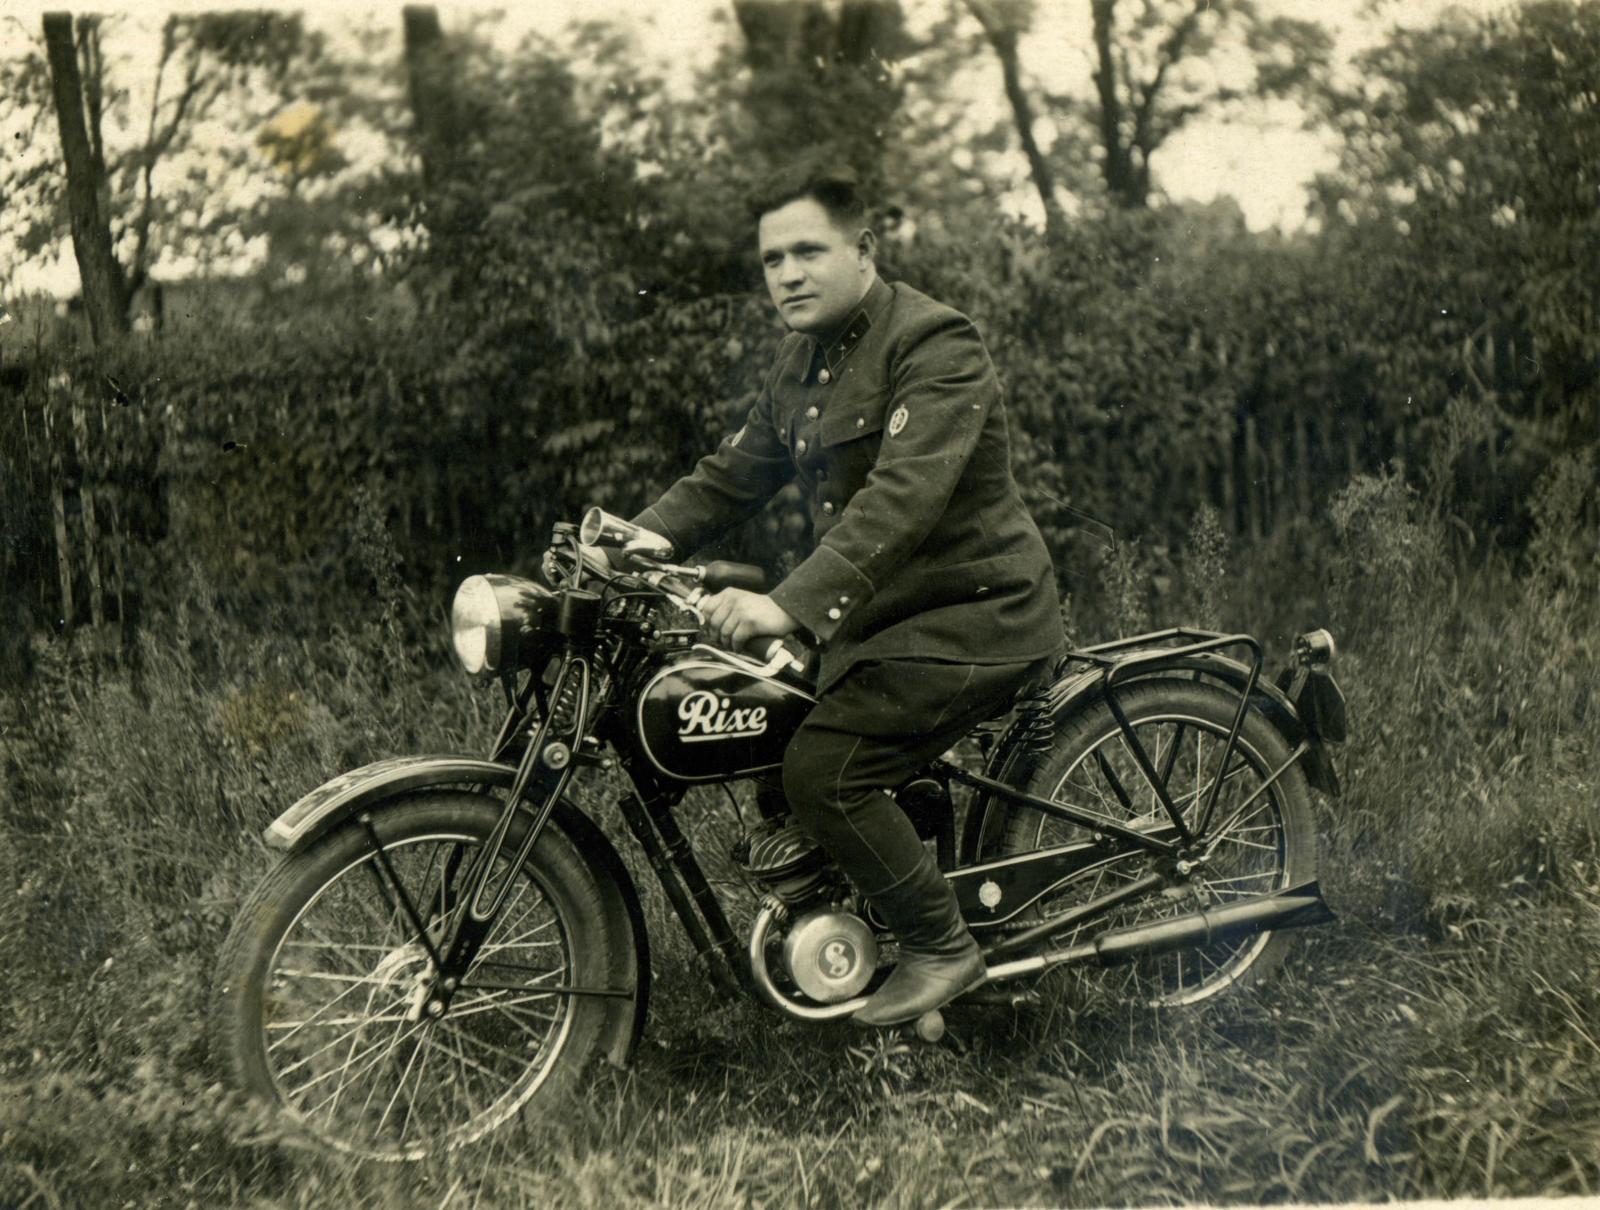 1940-е. Сержант ГБ Капшук Александр Тихонович на мотоцикле Rixe